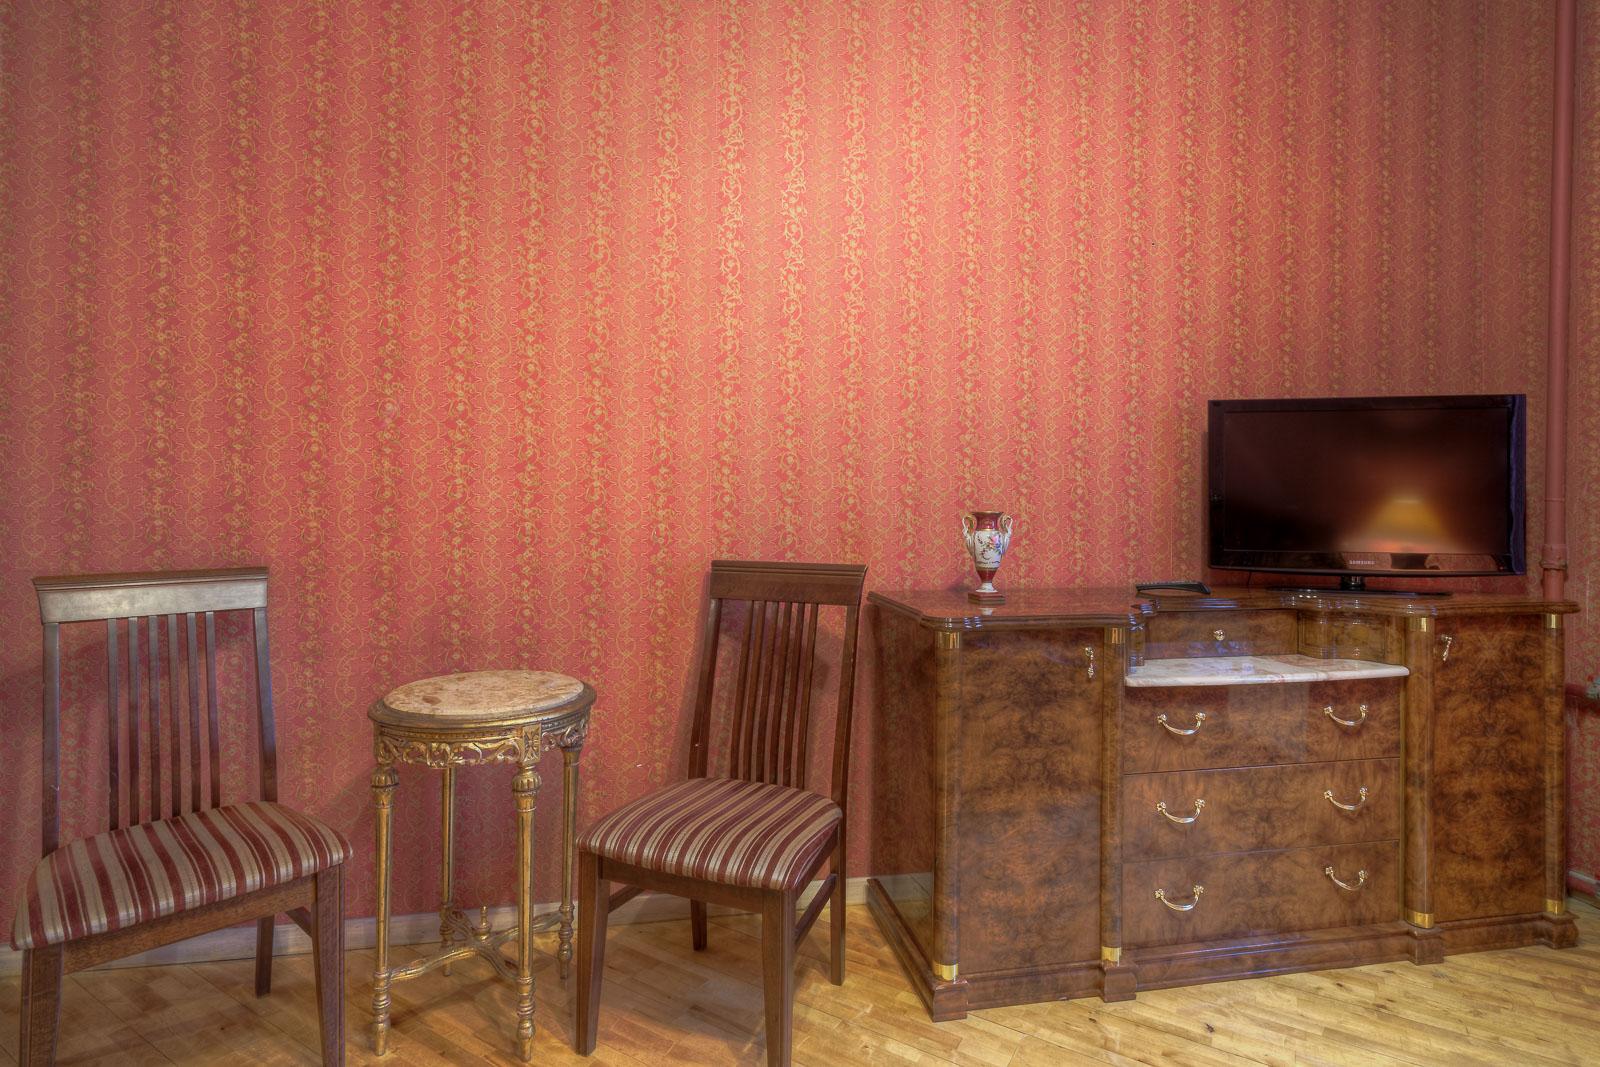 http://city-otel.ru/wp-content/uploads/2018/03/hotel_sity_lux3_2.jpg